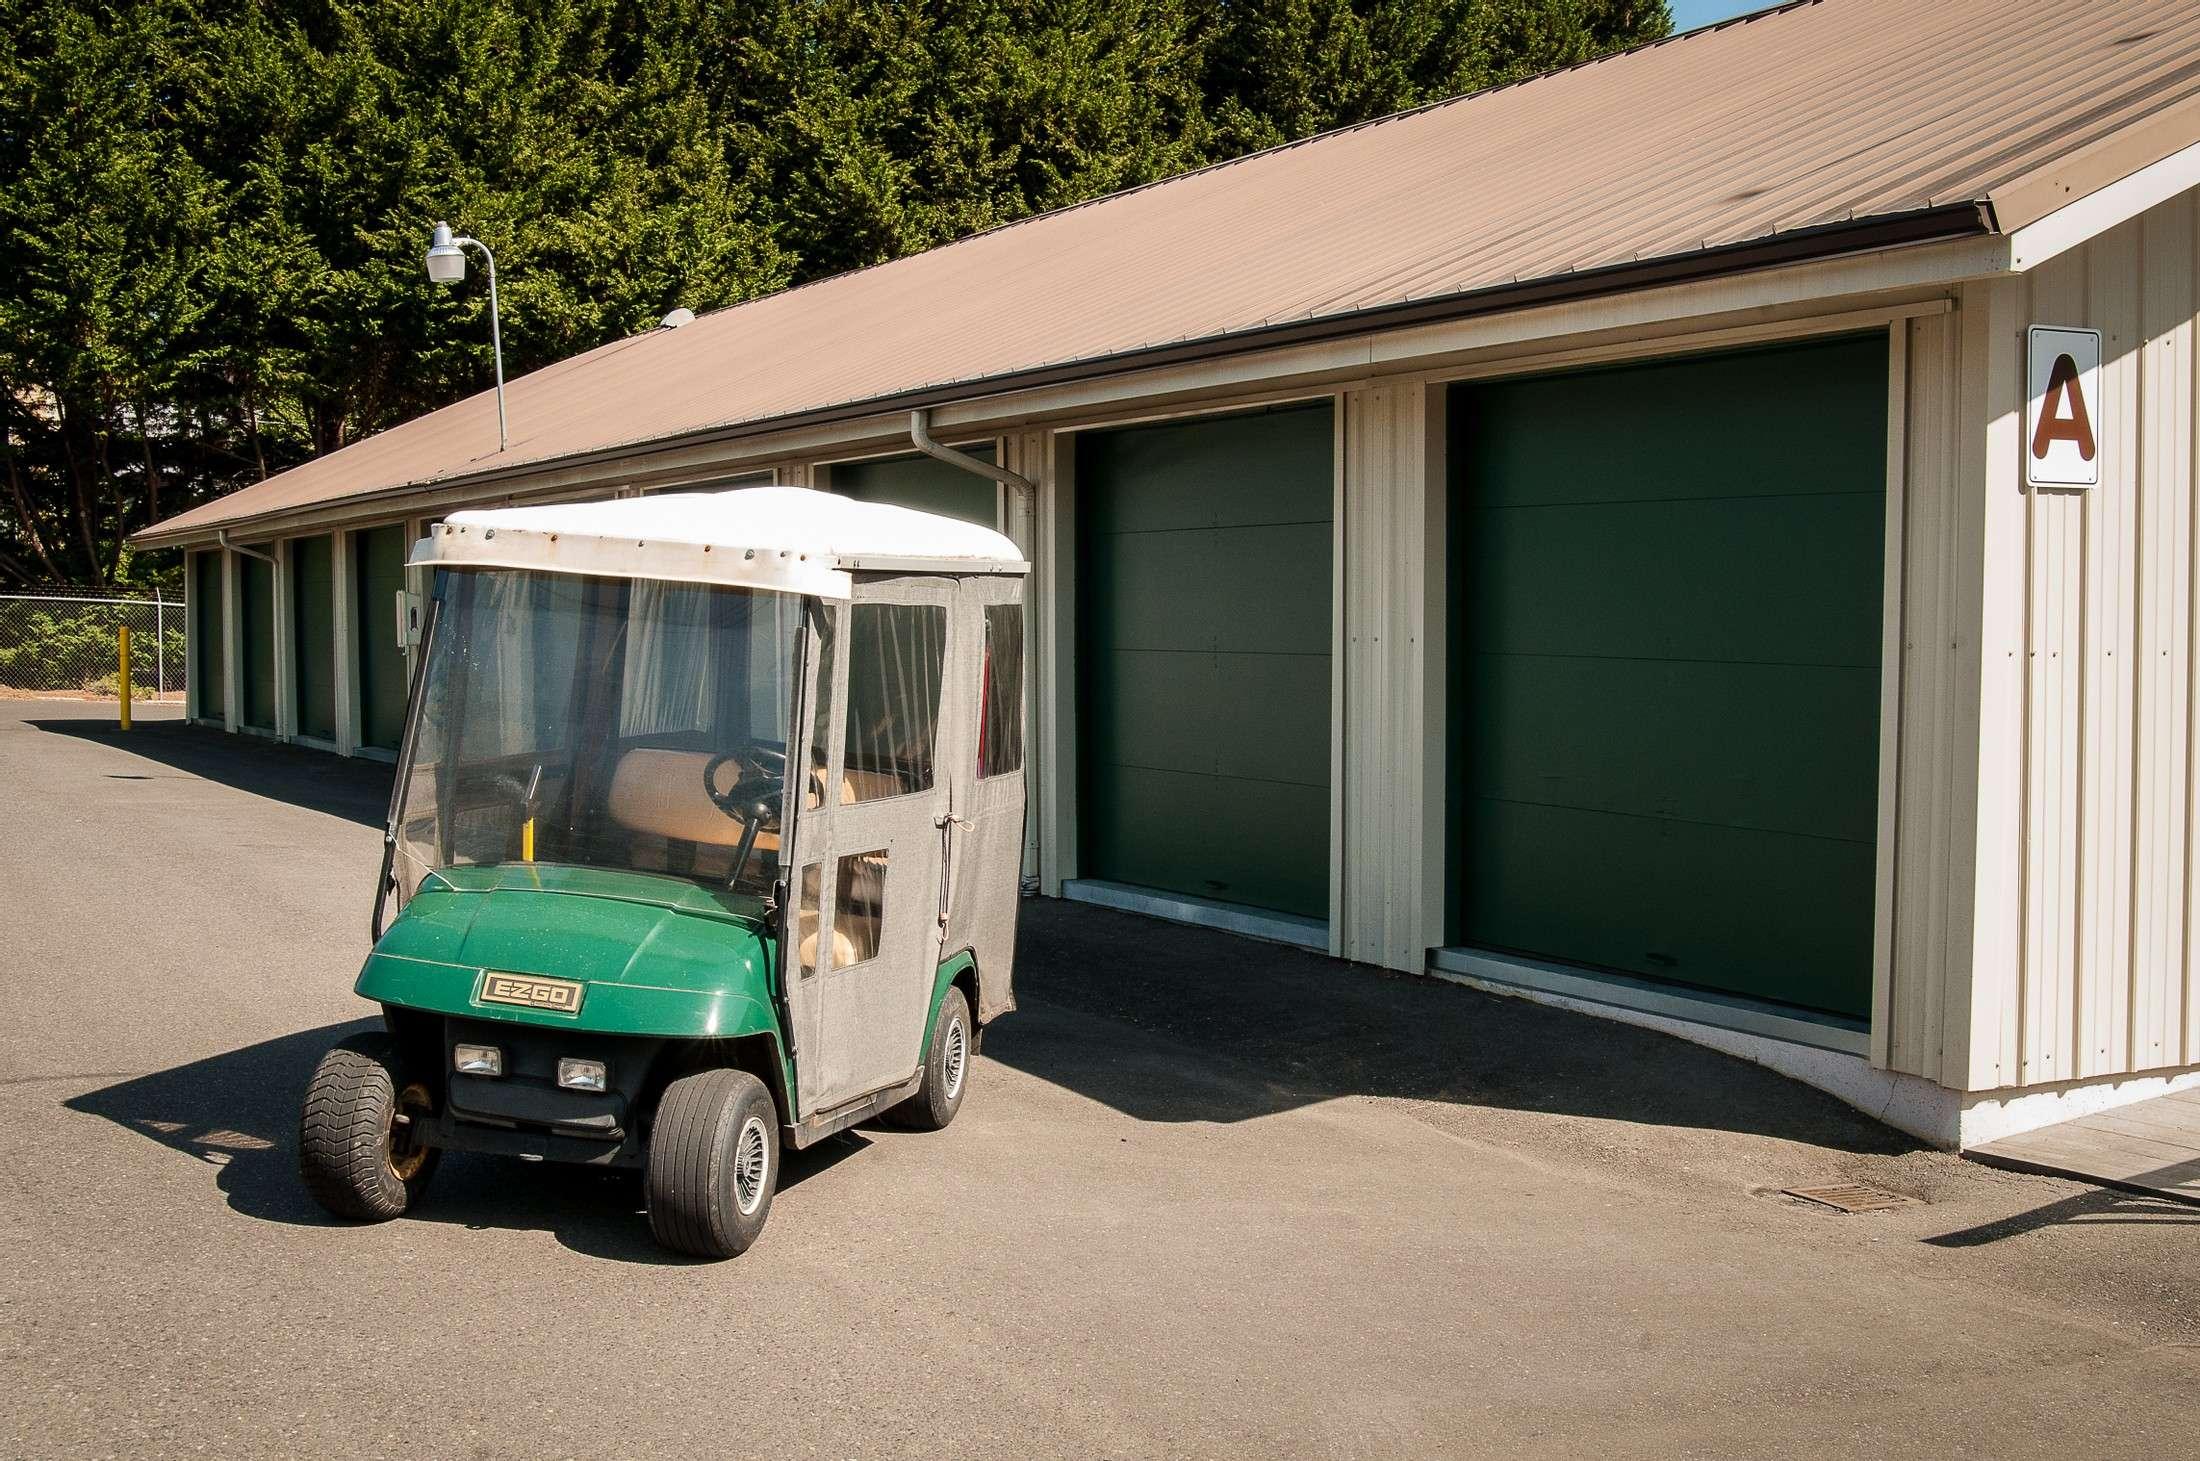 Reliable Storage Bainbridge golf cart on aisle